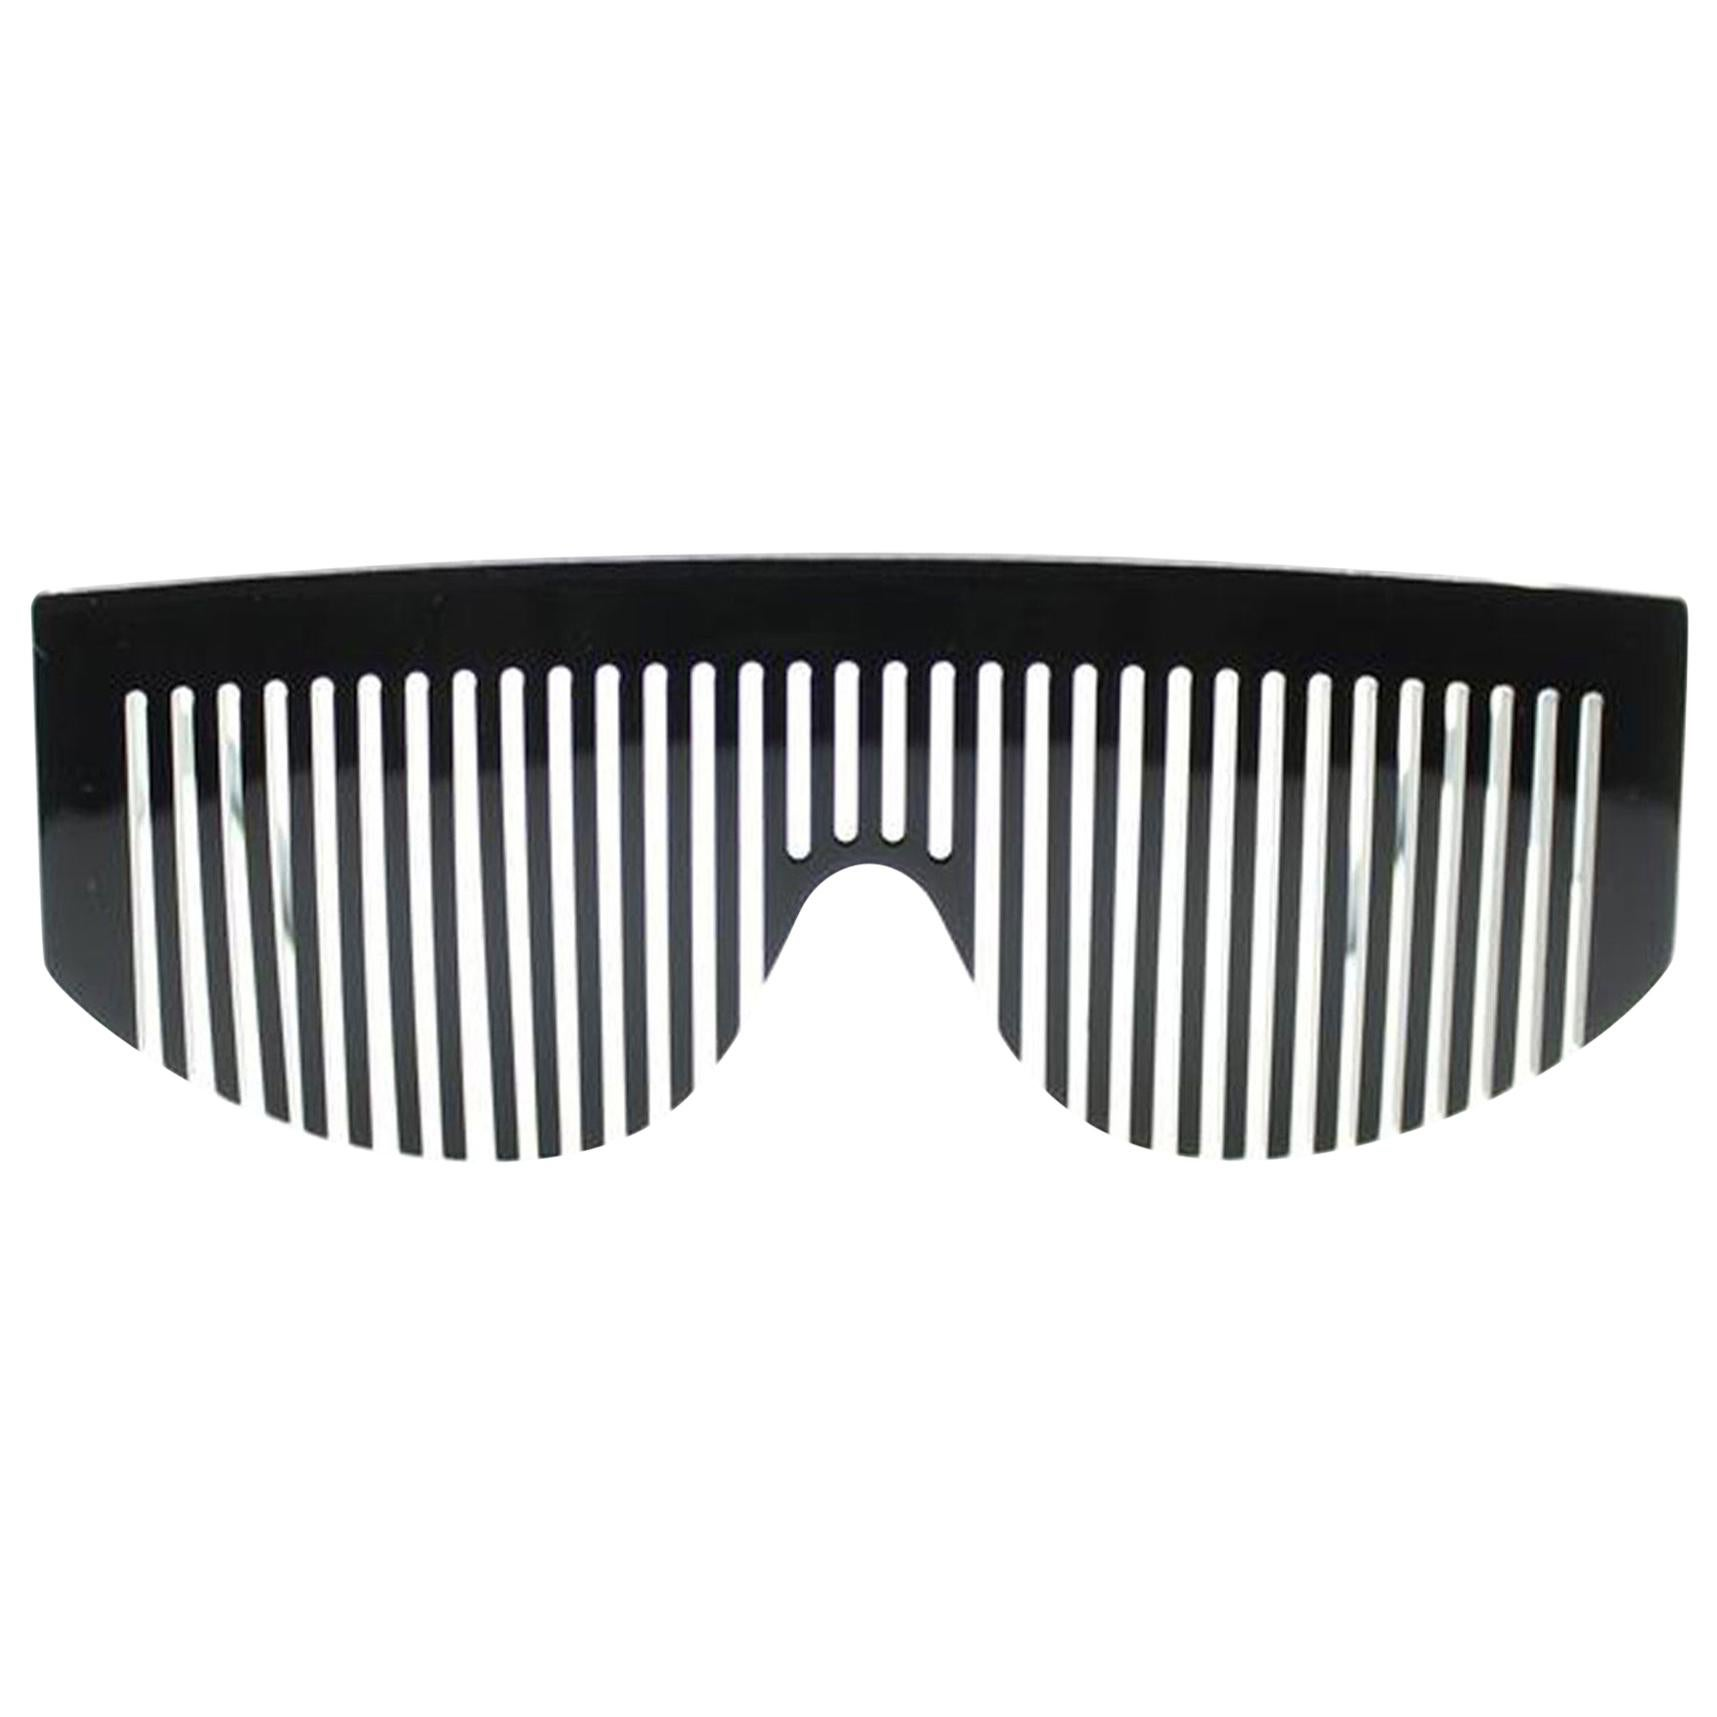 Chanel Black Rare Vintage 90's Runway Limited Edition Collectors Sunglasses